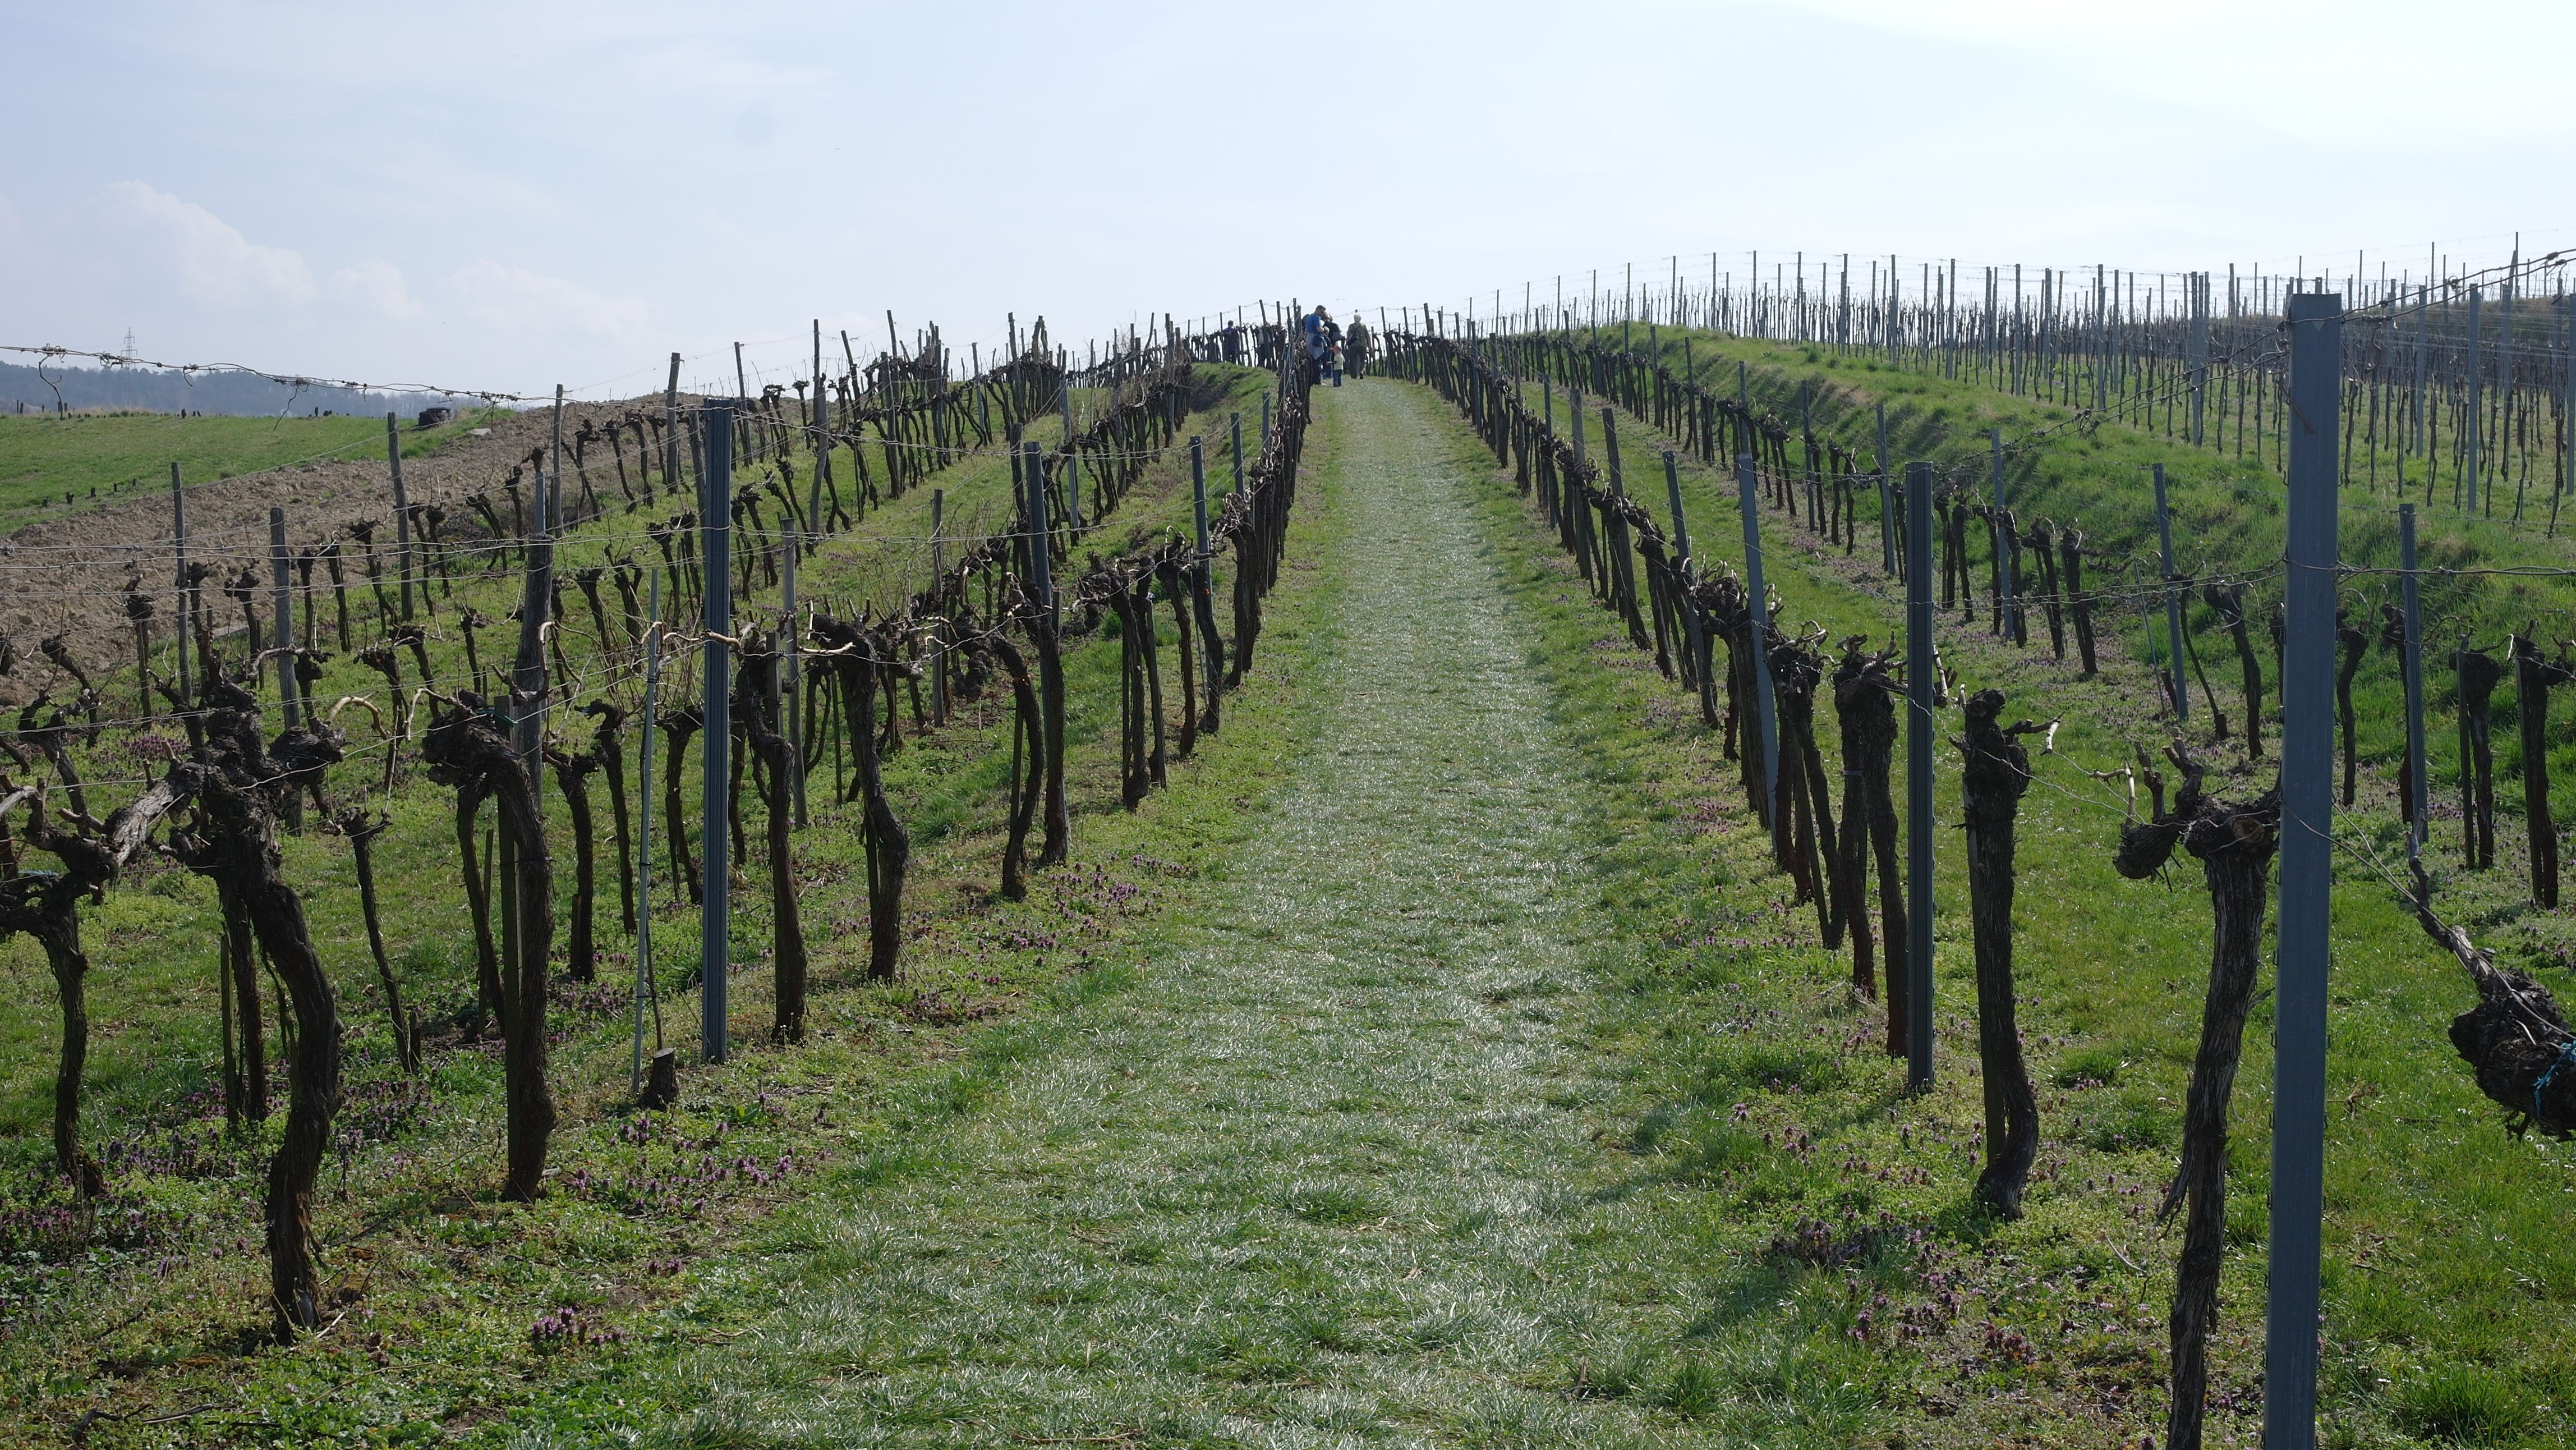 #austria #wachau #vine #vinery #vineyard #winery